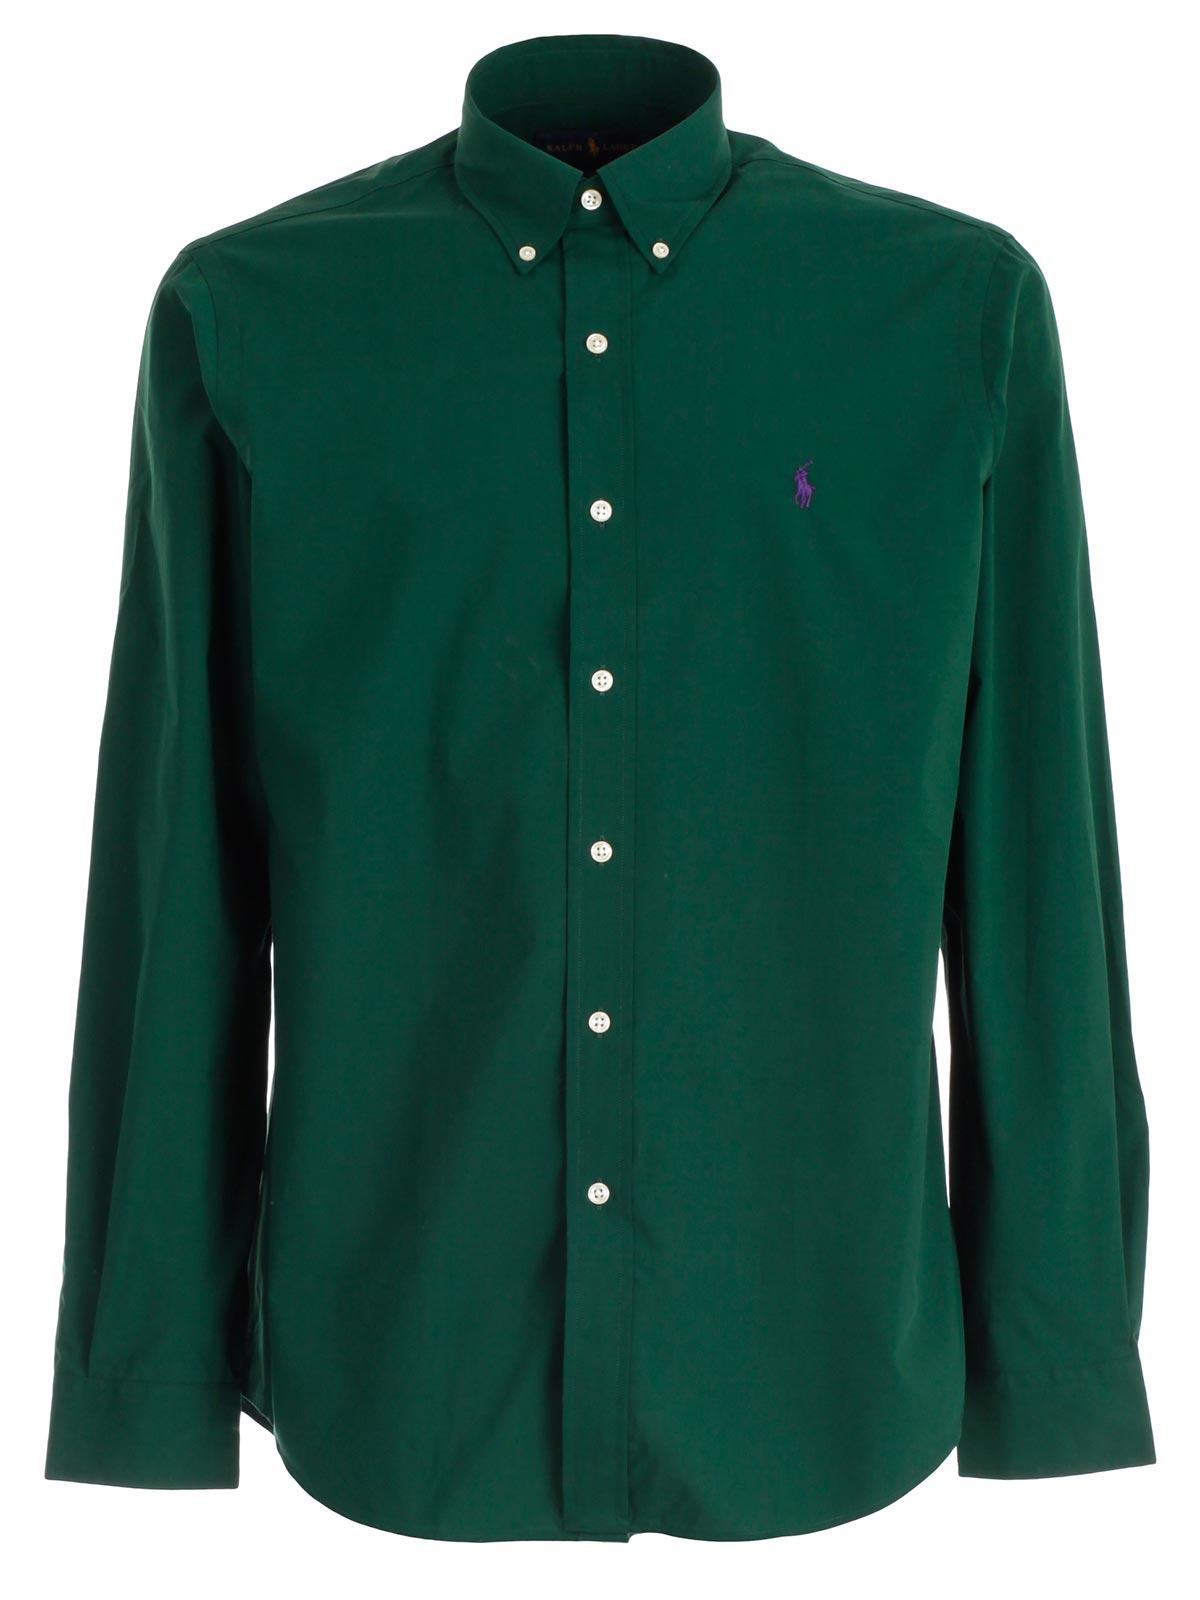 Polo Ralph Lauren Shirt 710.716296.003 - COLLEGE GREEN.Bernardelli ... 536f41da6